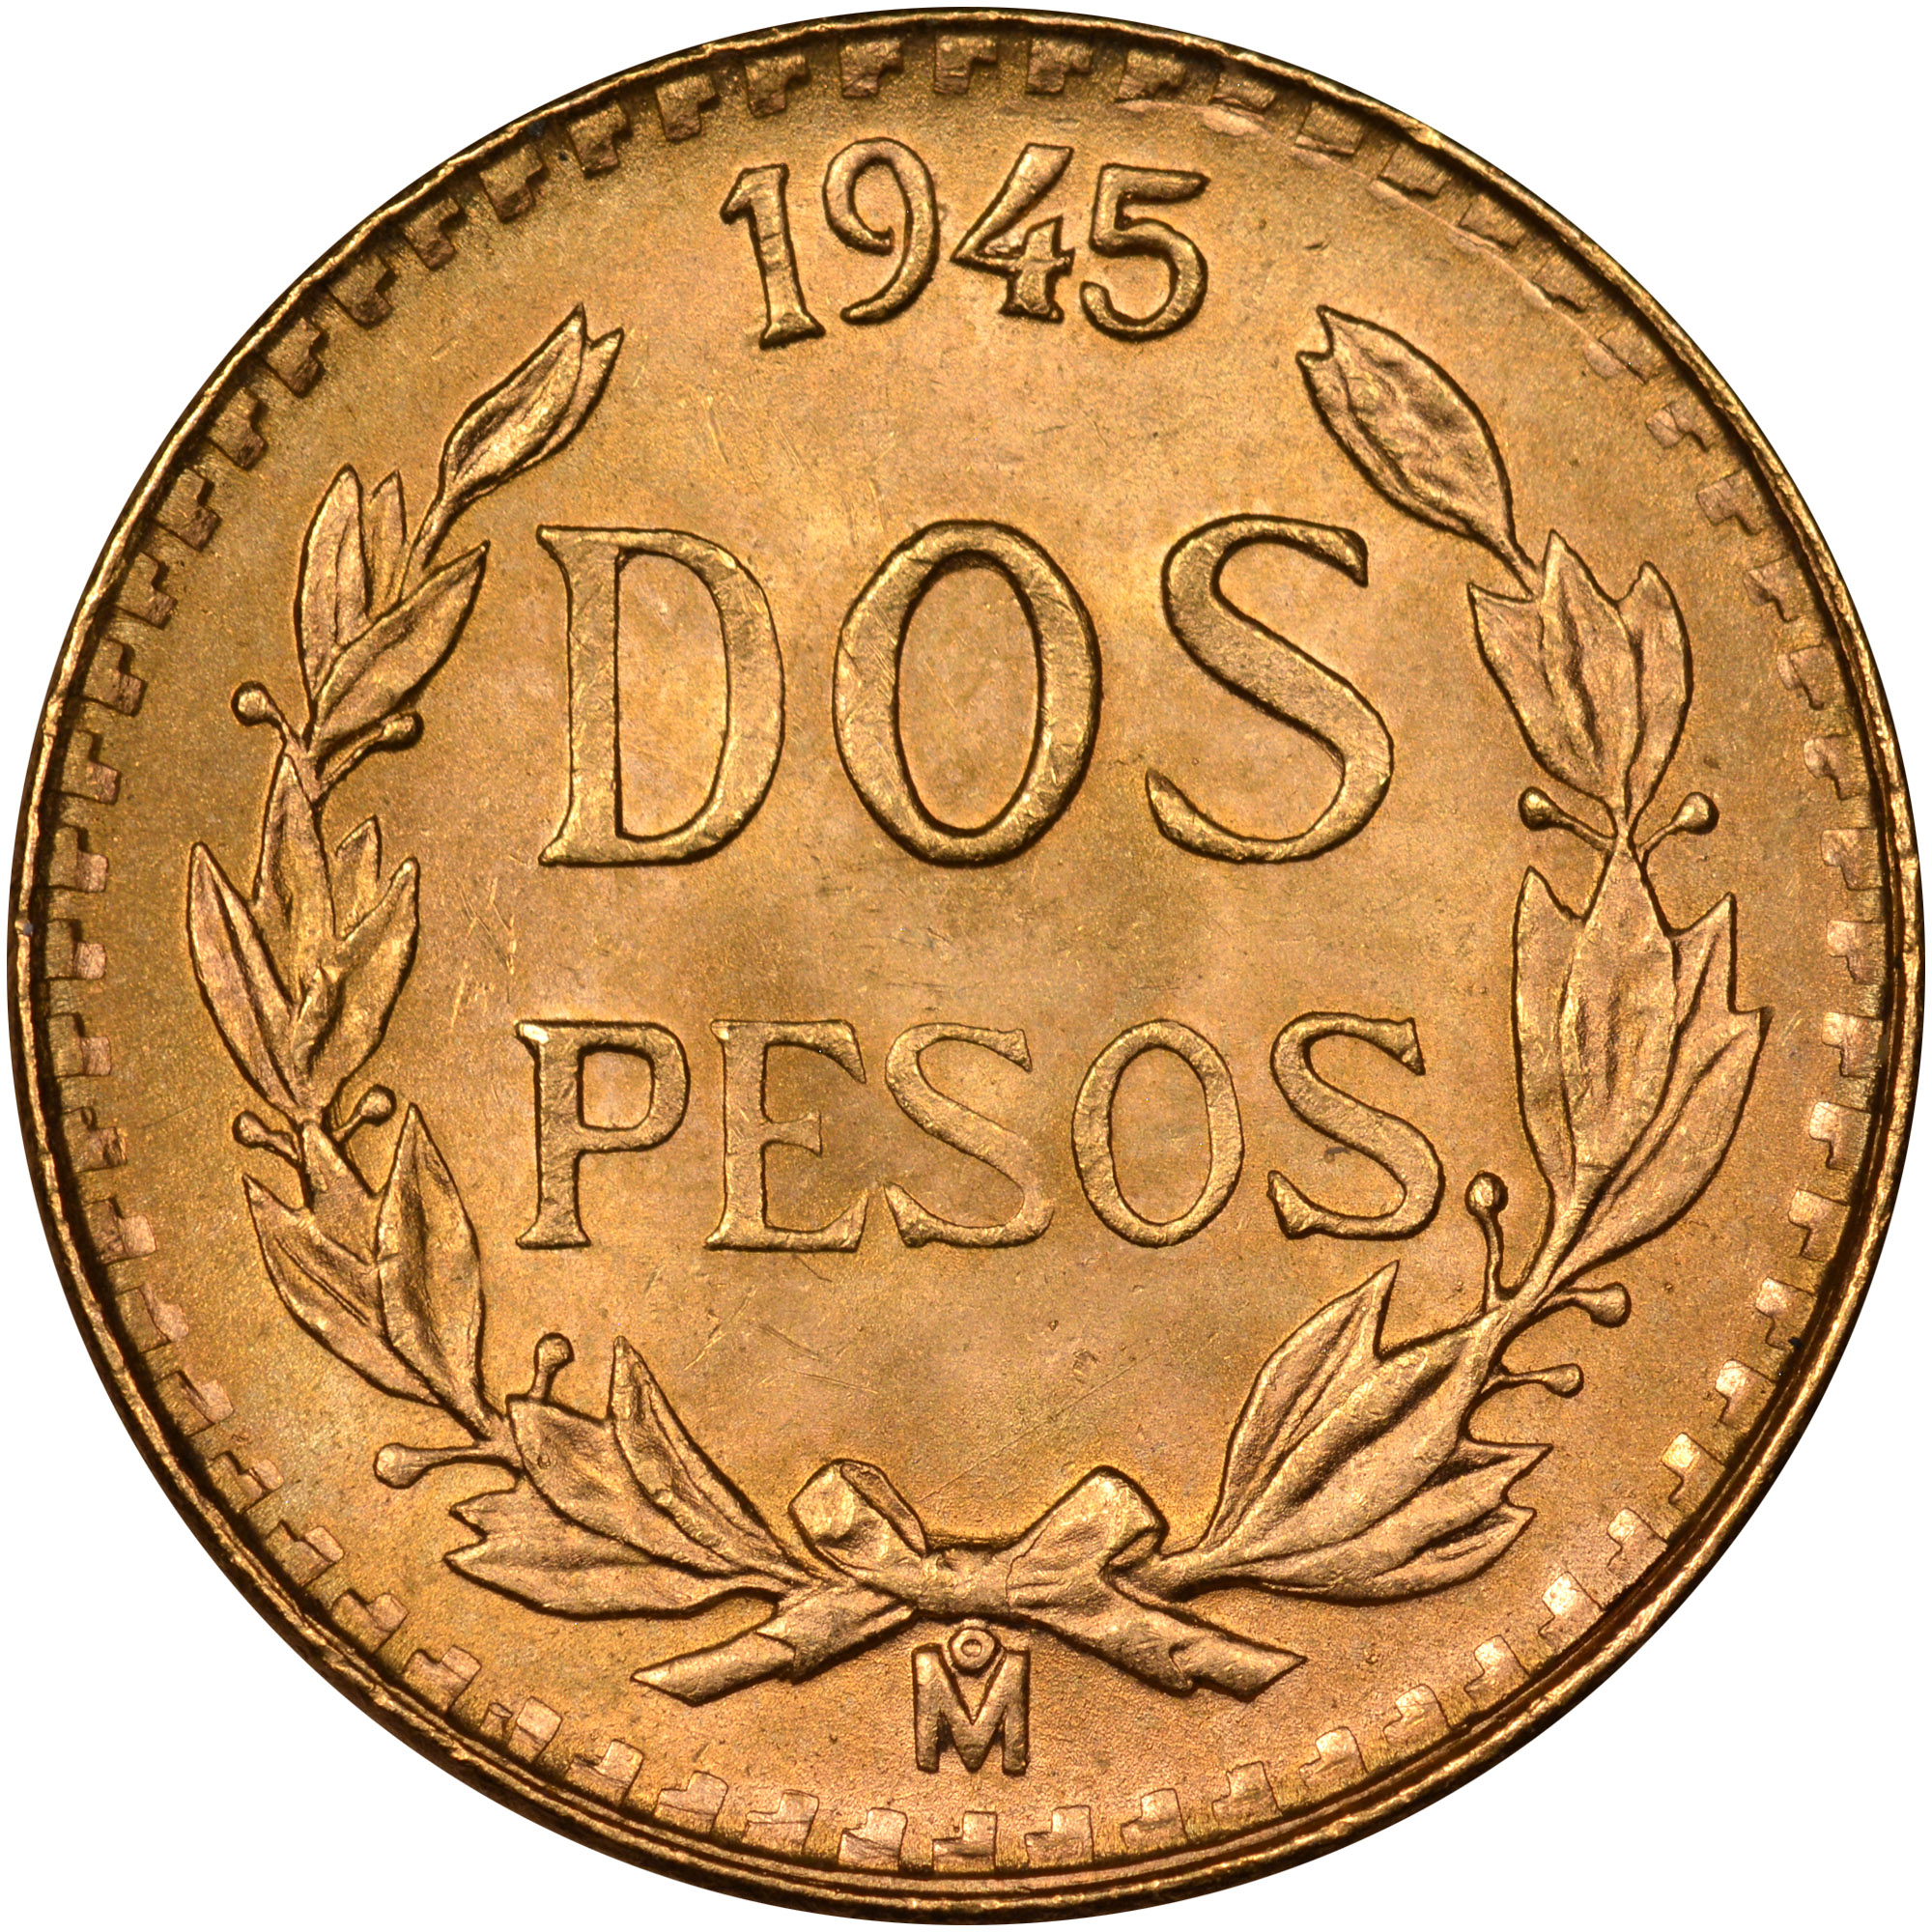 Mexico ESTADOS UNIDOS MEXICANOS 2 Pesos reverse